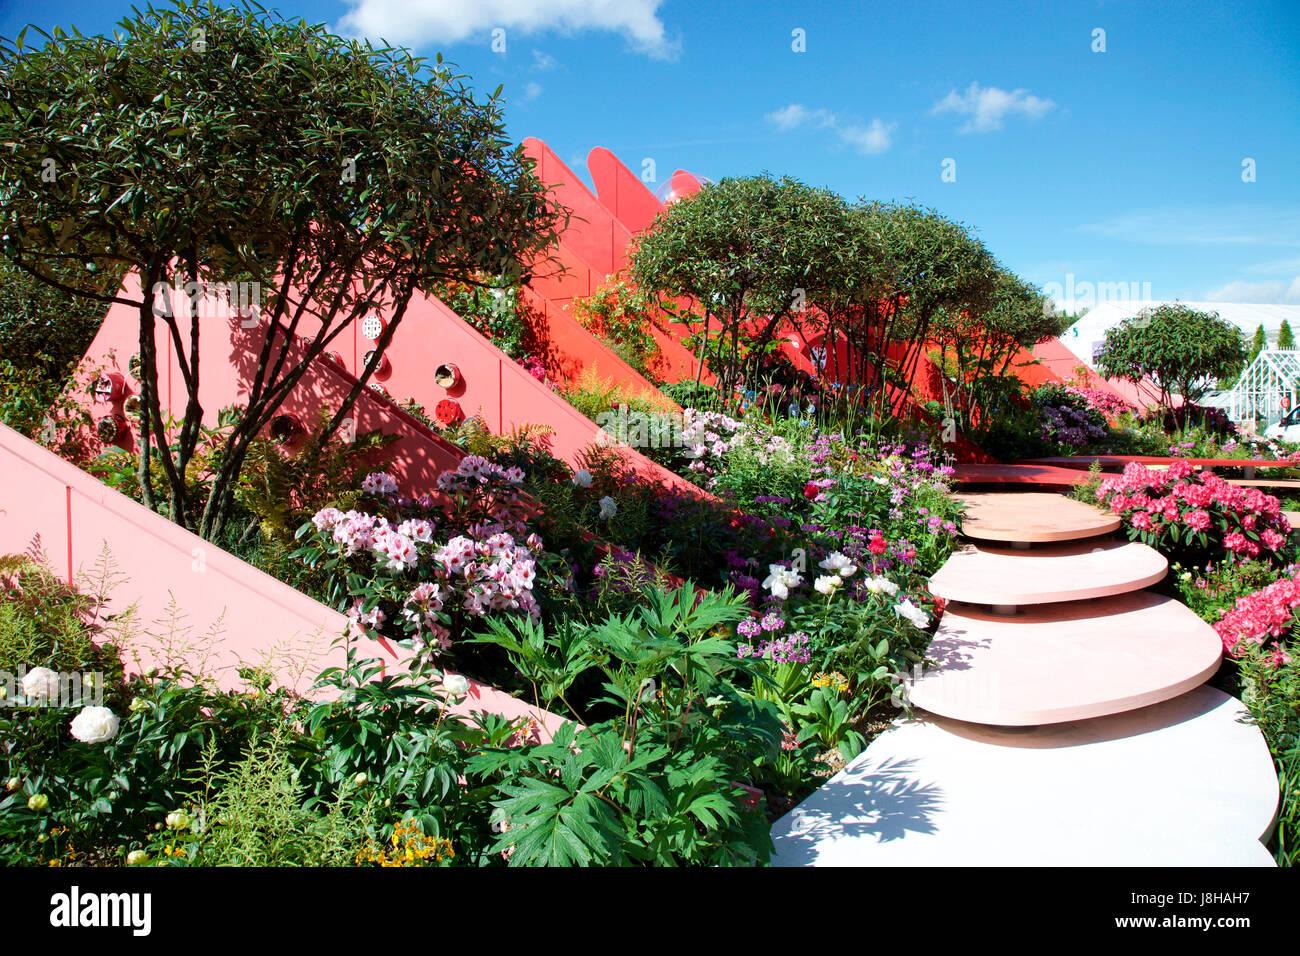 The Silk Road Garden Chengdu China by